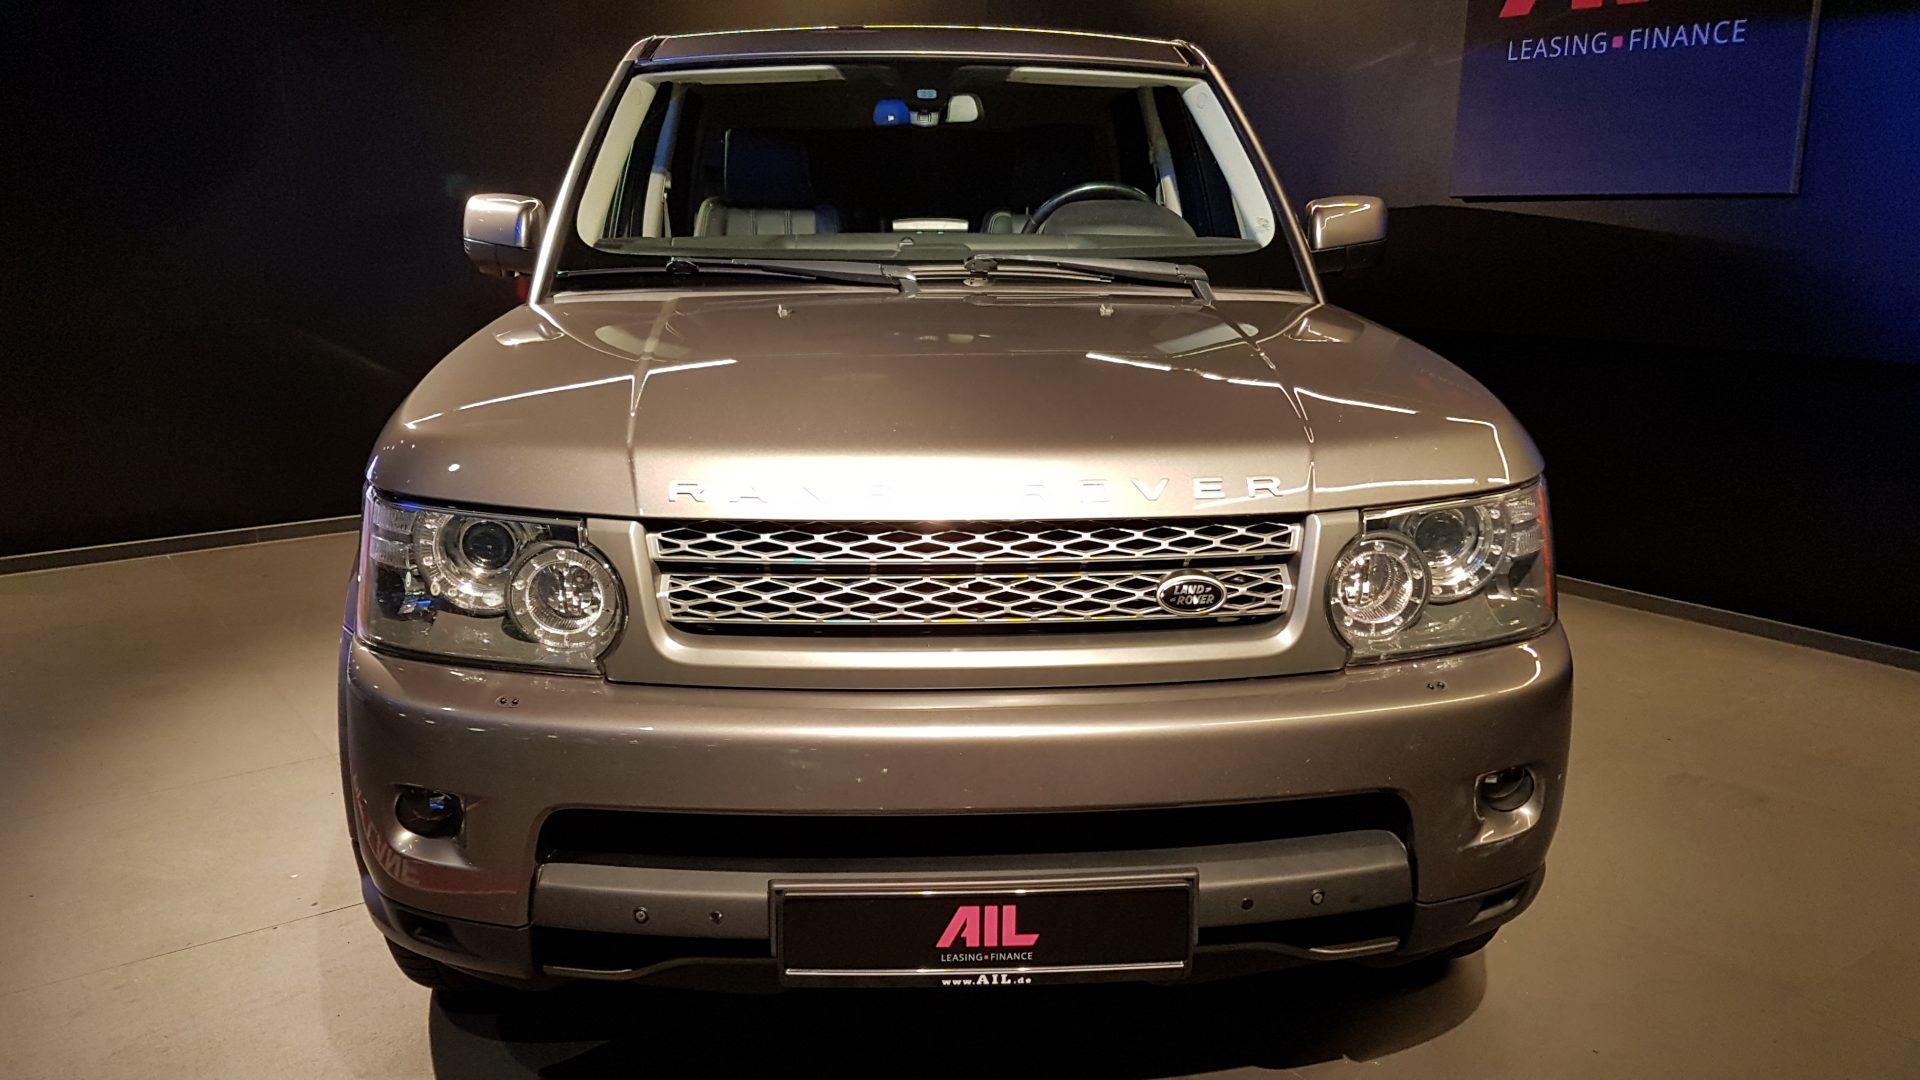 AIL Land Rover Range Rover Sport TDV8 HSE 2